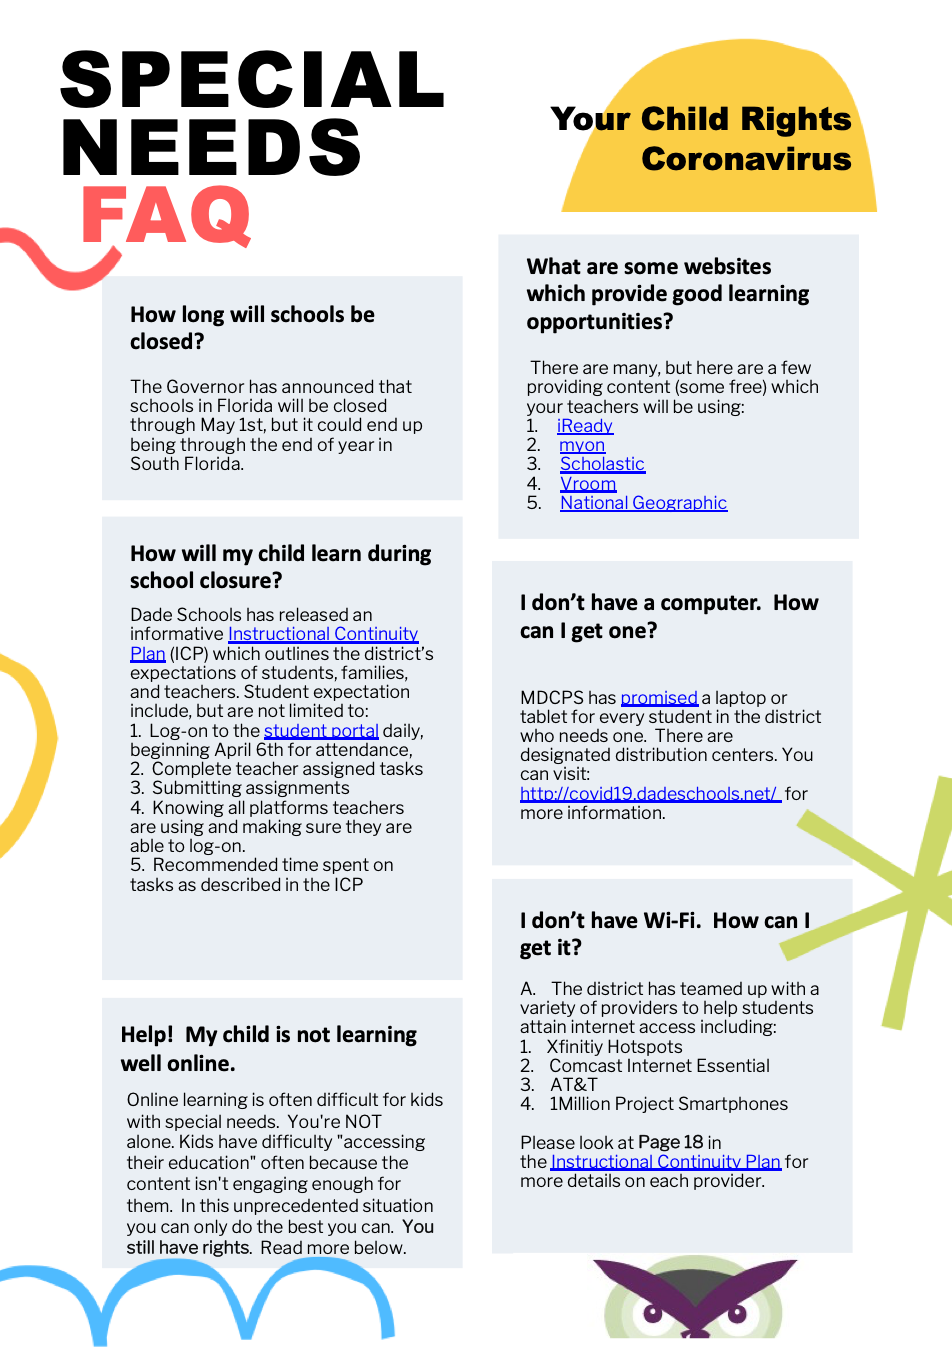 Special Needs FAQ Coronavirus